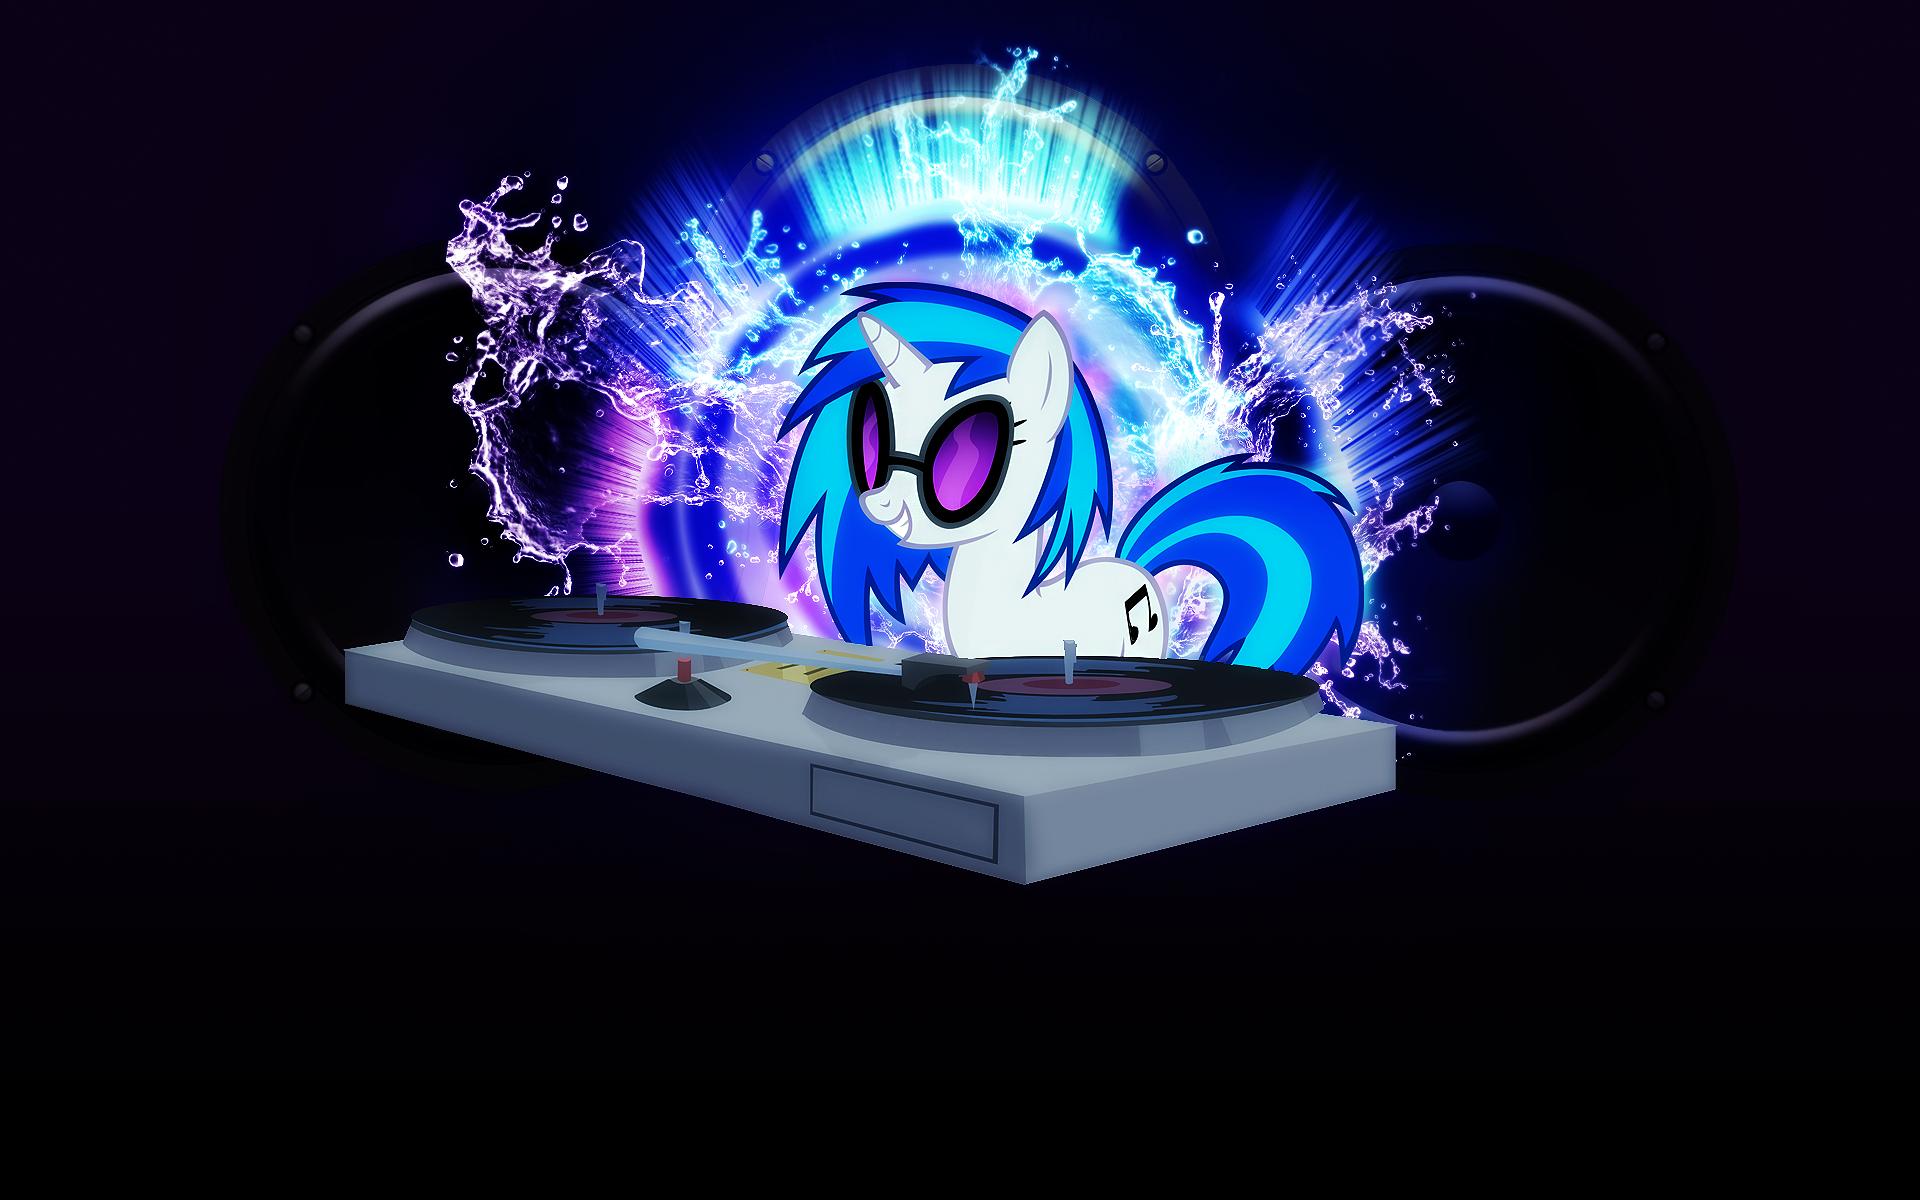 Spotlight - DJ PON3 by AK71, MoongazePonies and Vividkinz